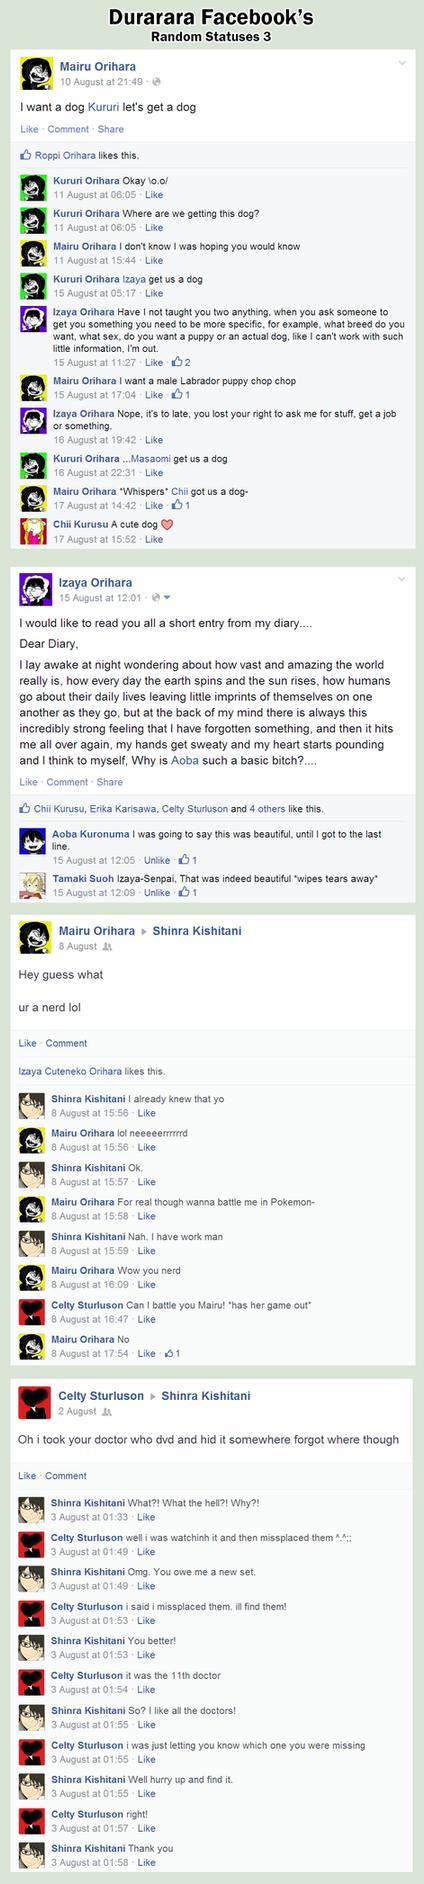 DURRR FB: Random Status [3] by pwinsesducky